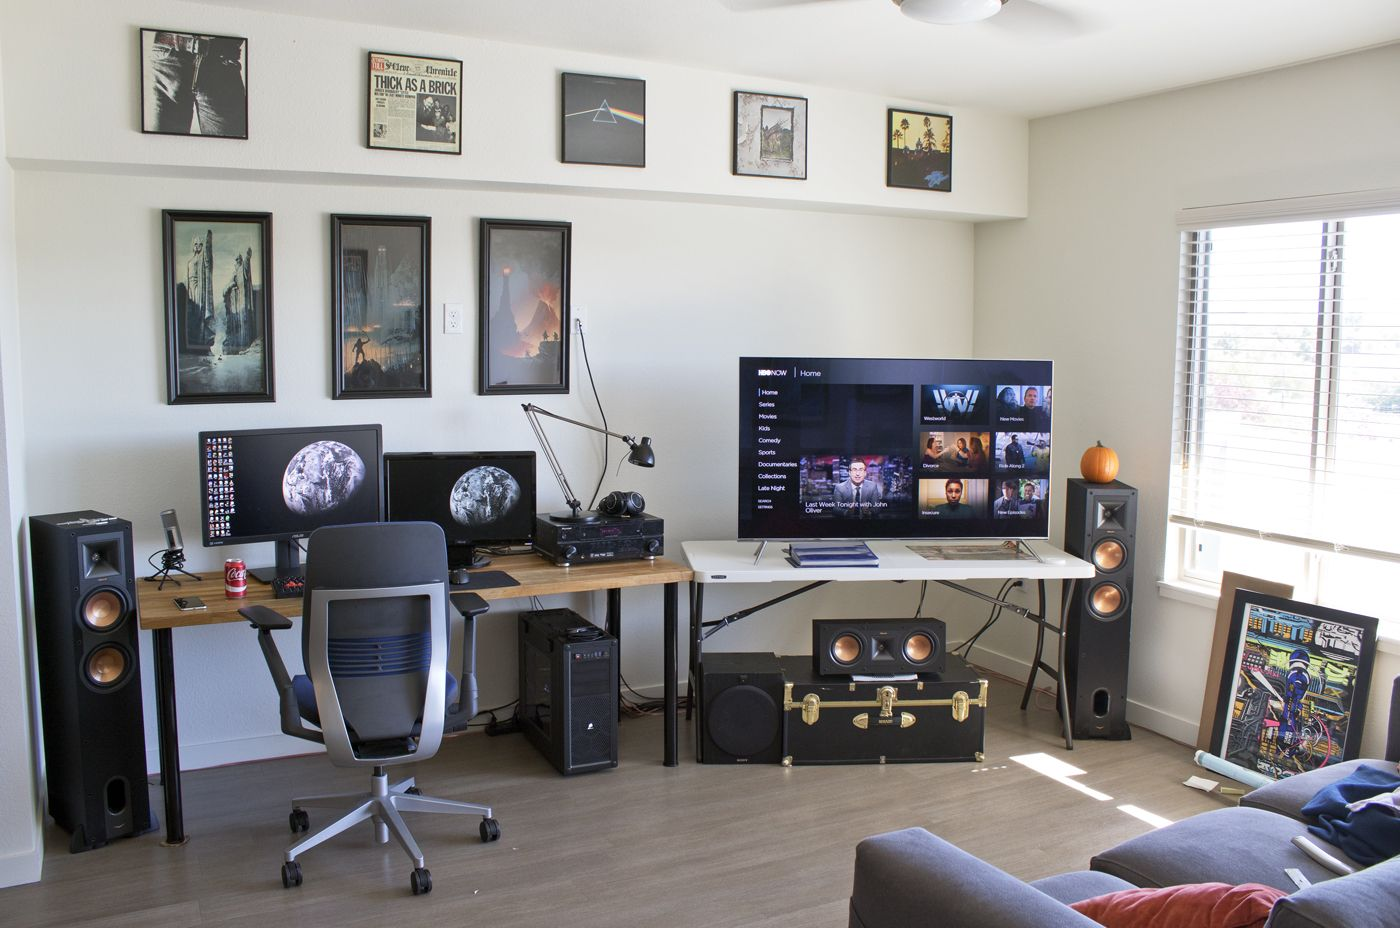 Http I Imgur Com Shwkvfc Jpg Game Room Decor Home Office Setup Game Room Design